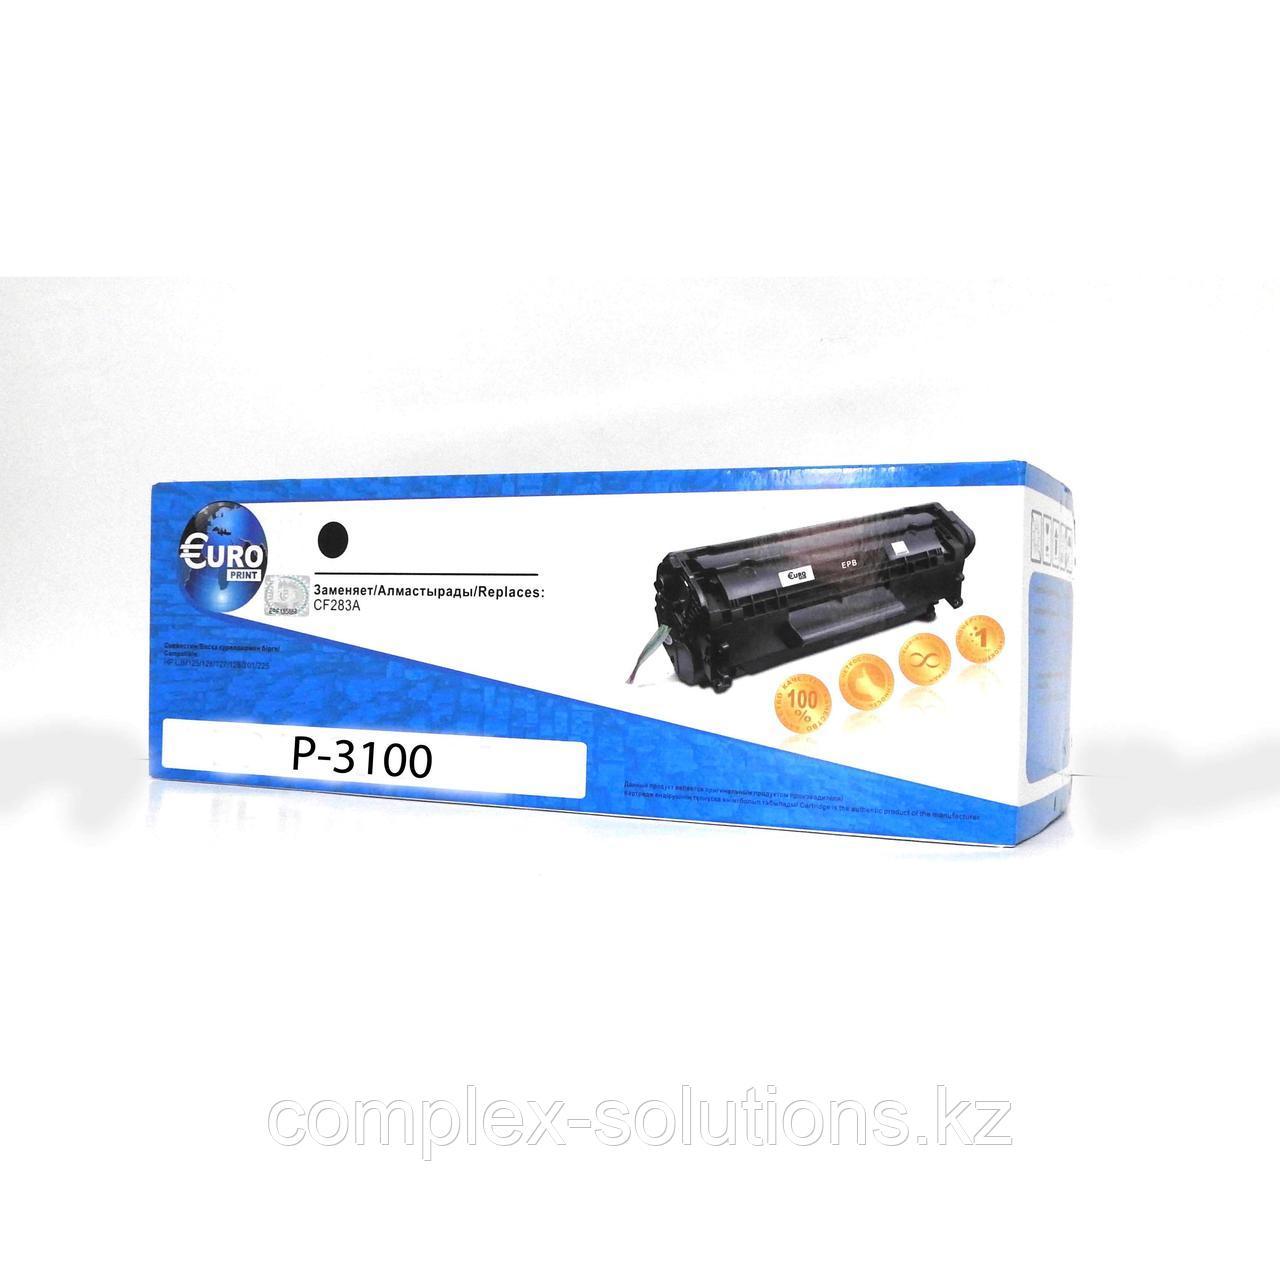 Картридж XEROX Phaser 3100 (3K) (106R01378) OEM   [качественный дубликат]